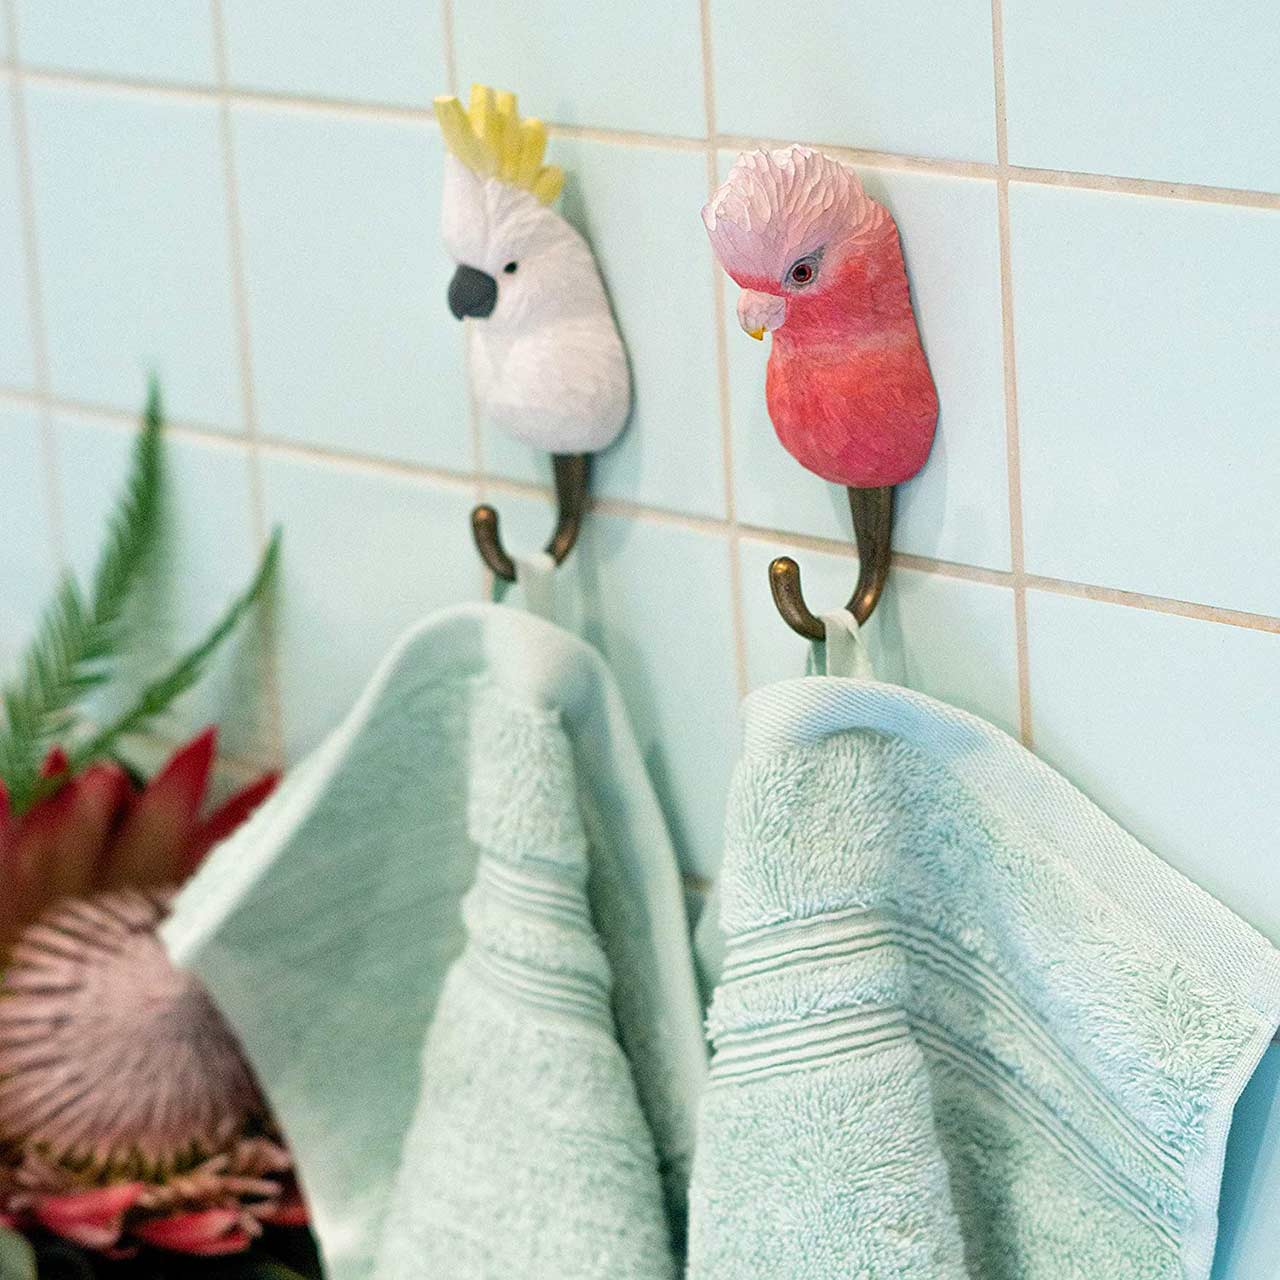 WILDLIFE GARDEN Wall Hook Cockatoo (Galah not part of the offer) | the design gift shop